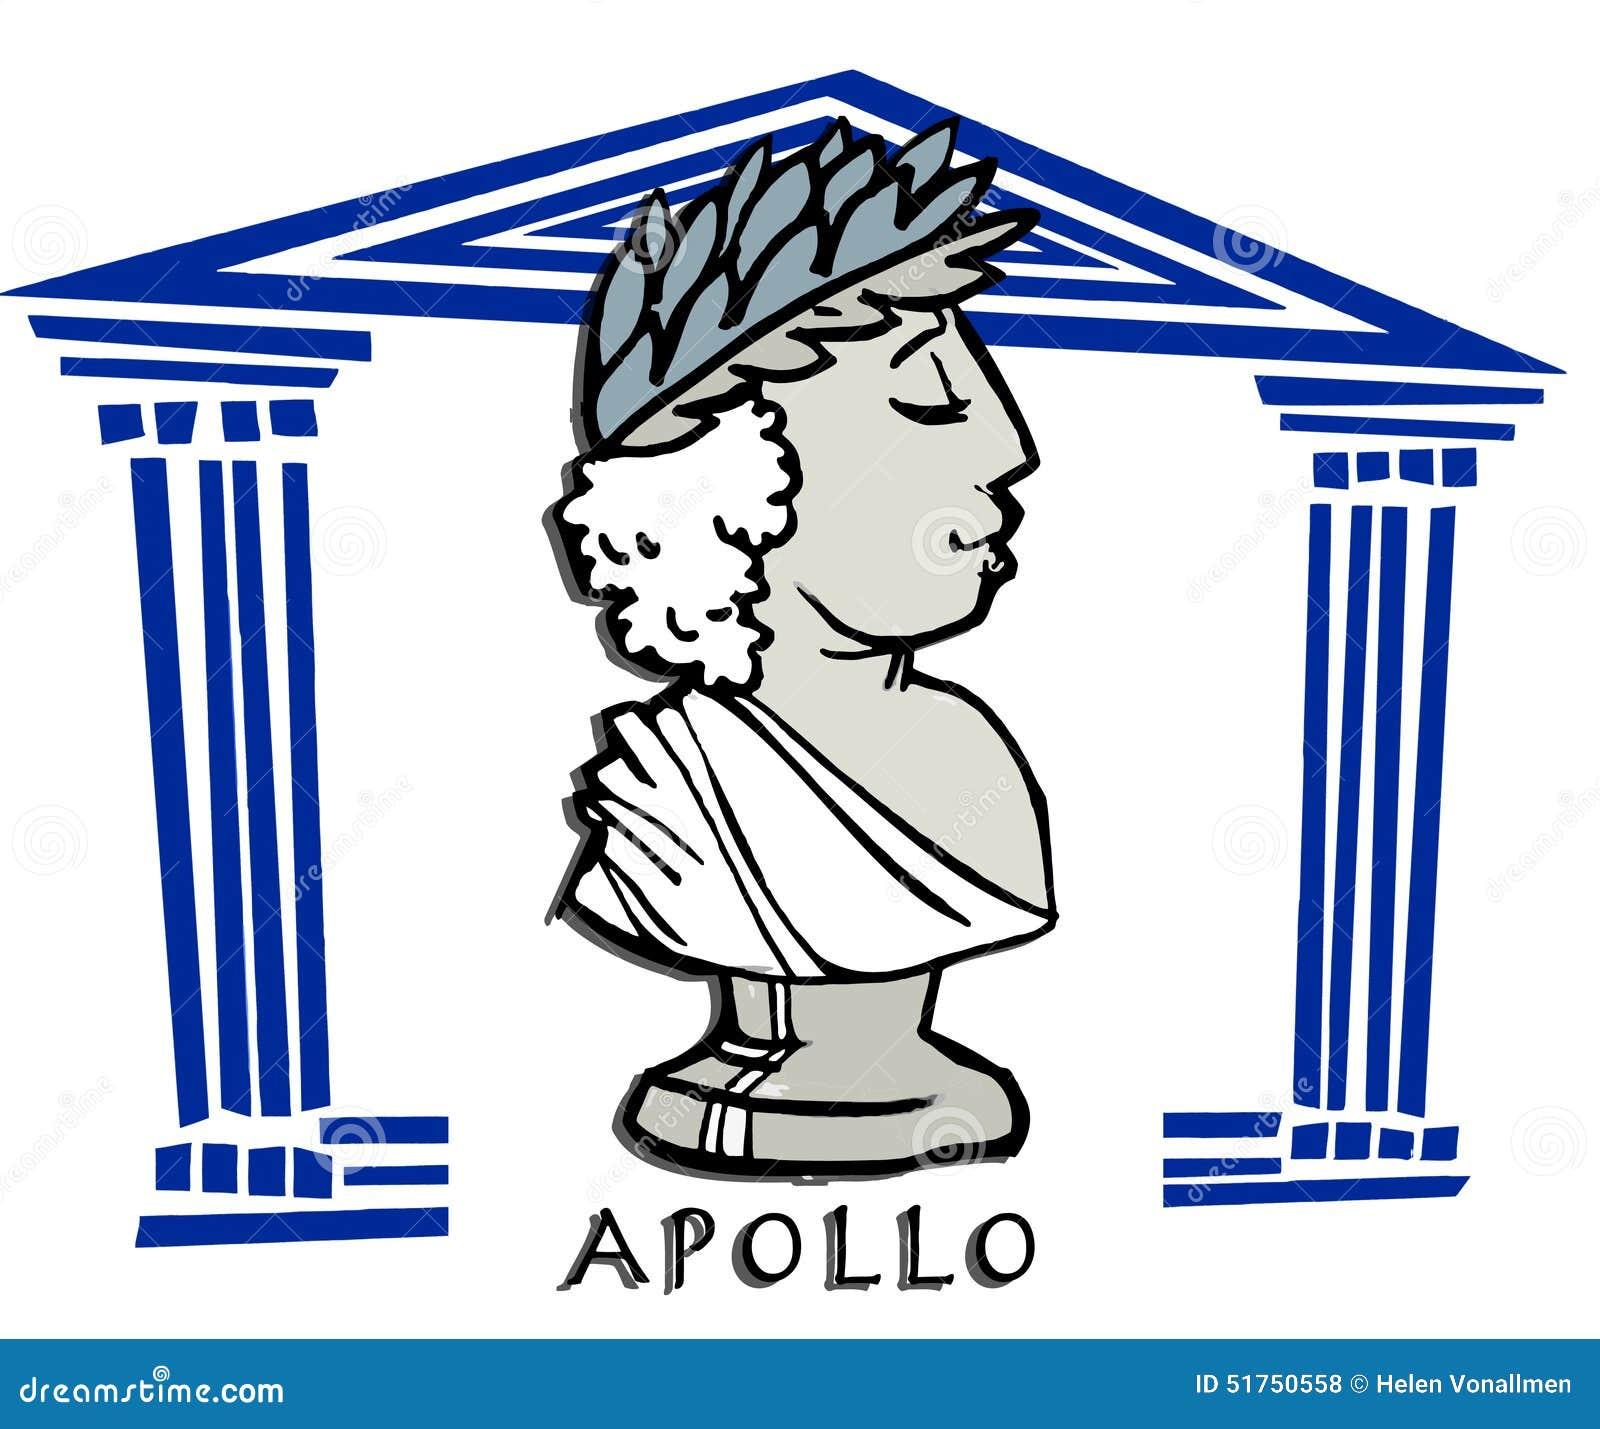 Apollophoebus greek god cartoon stock vector illustration of apollophoebus greek god cartoon biocorpaavc